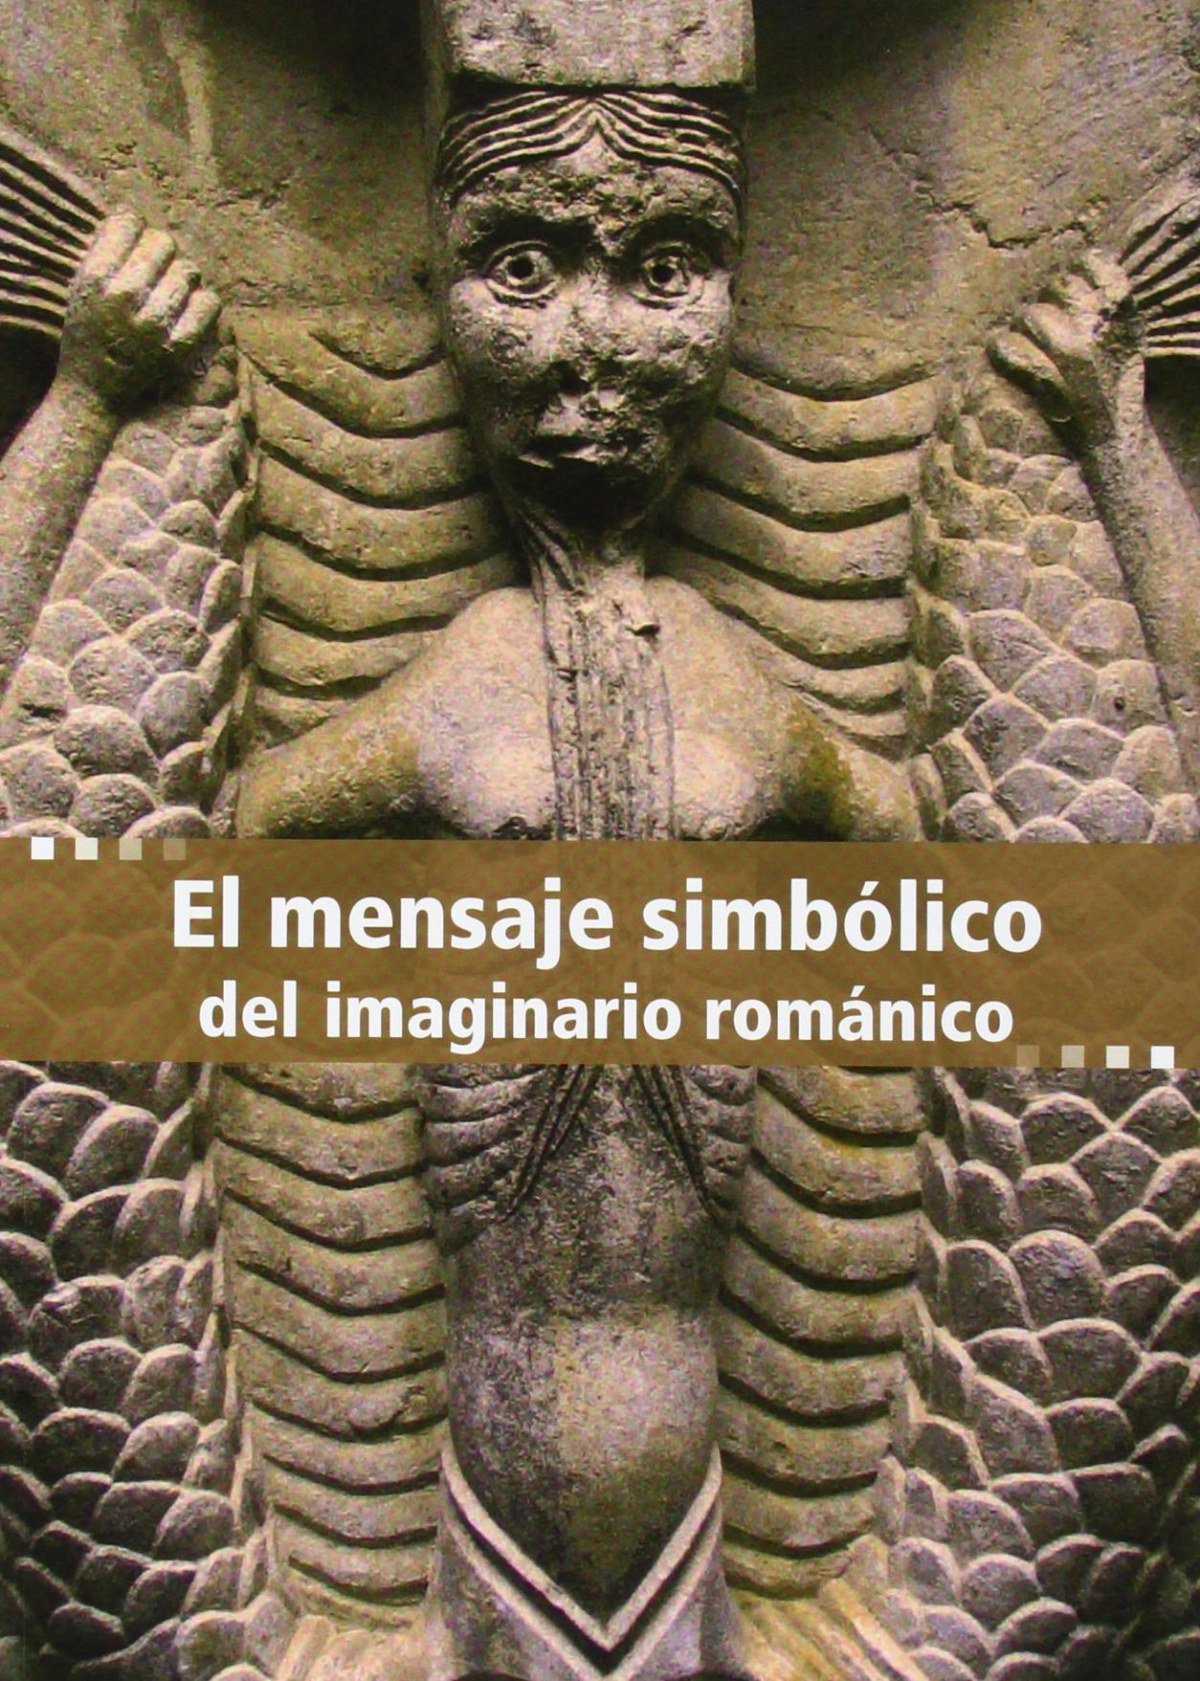 MENSAJE SIMBÓLICO DEL IMAGINARIO ROMÁNICO